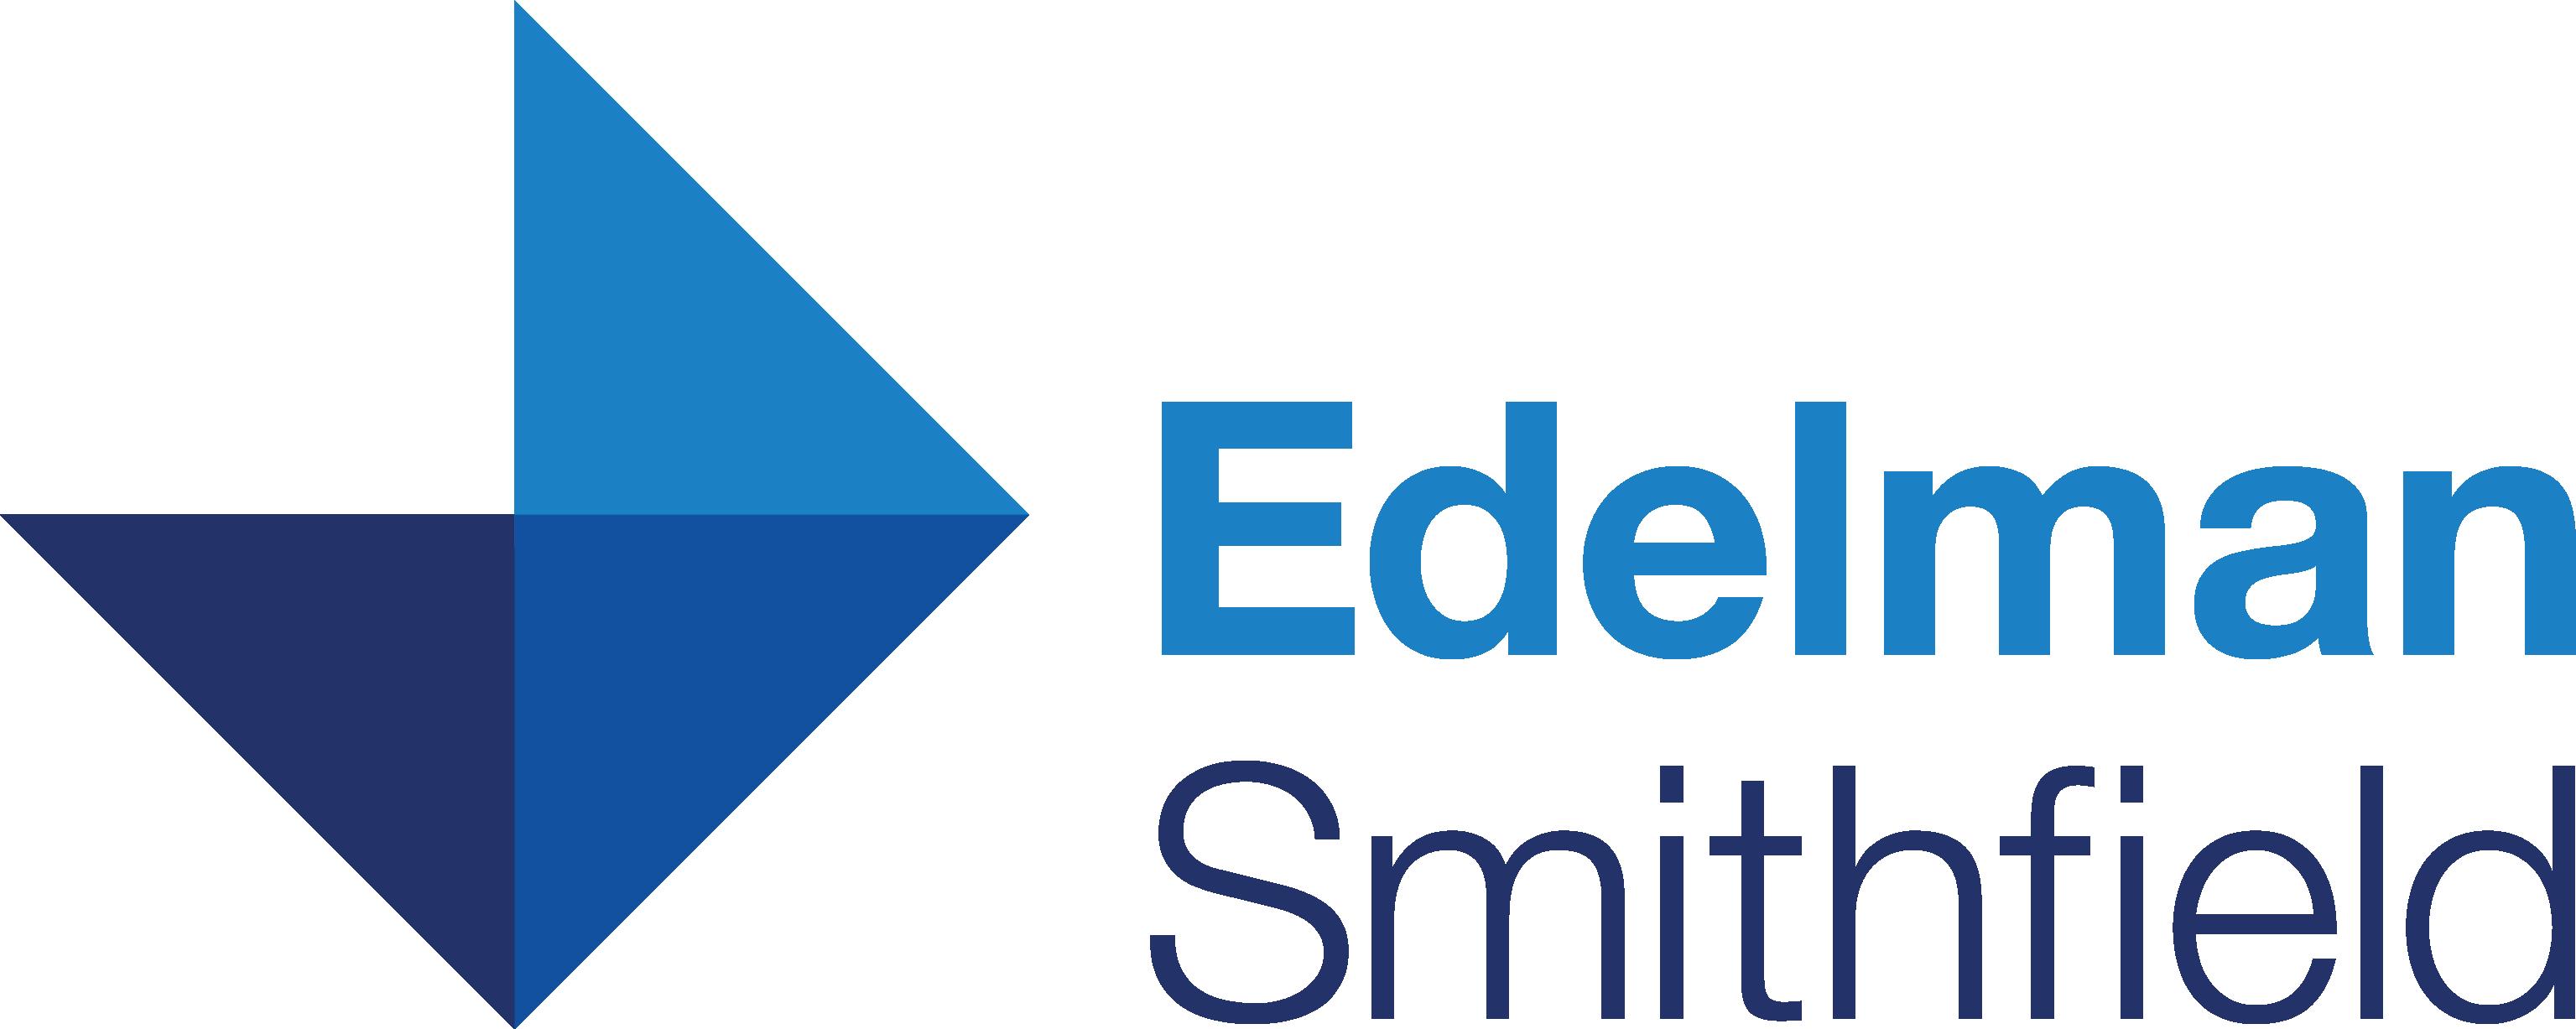 Edelman Smithfield